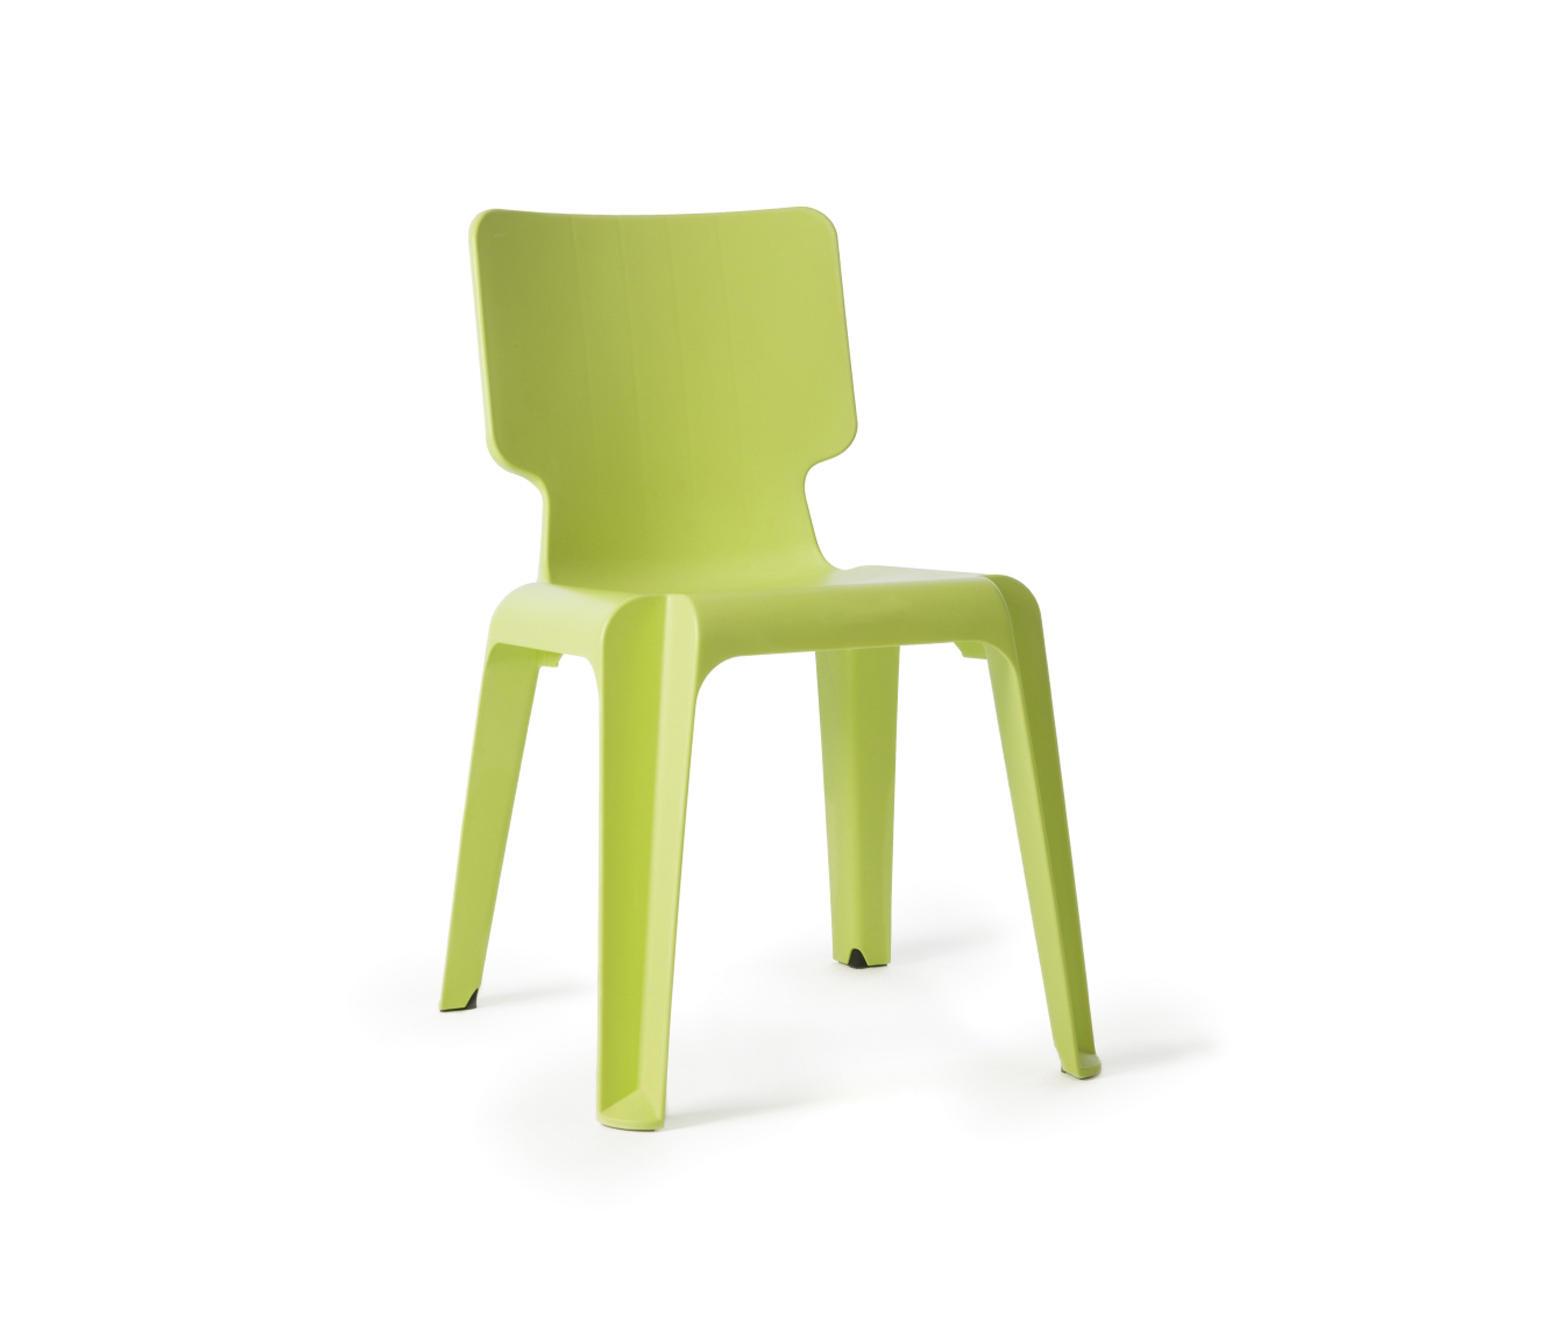 Contemporary Bathtub Chairs For Elderly Component - Custom Bathtubs ...